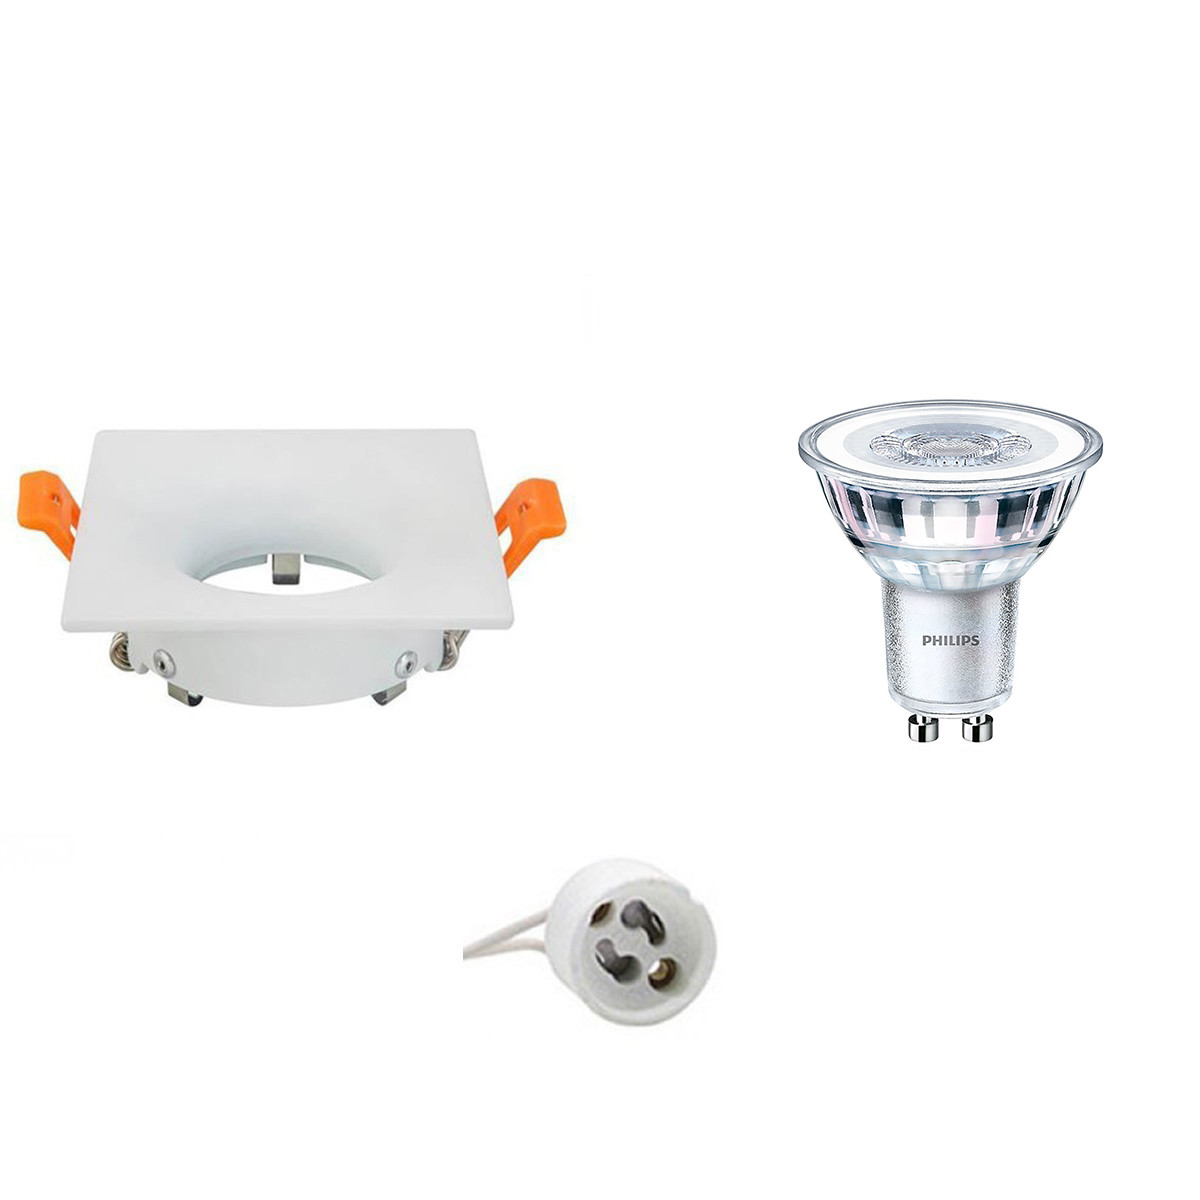 PHILIPS - LED Spot Set - CorePro 827 36D - GU10 Fitting - Dimbaar - Inbouw Vierkant - Mat Wit - 5W -